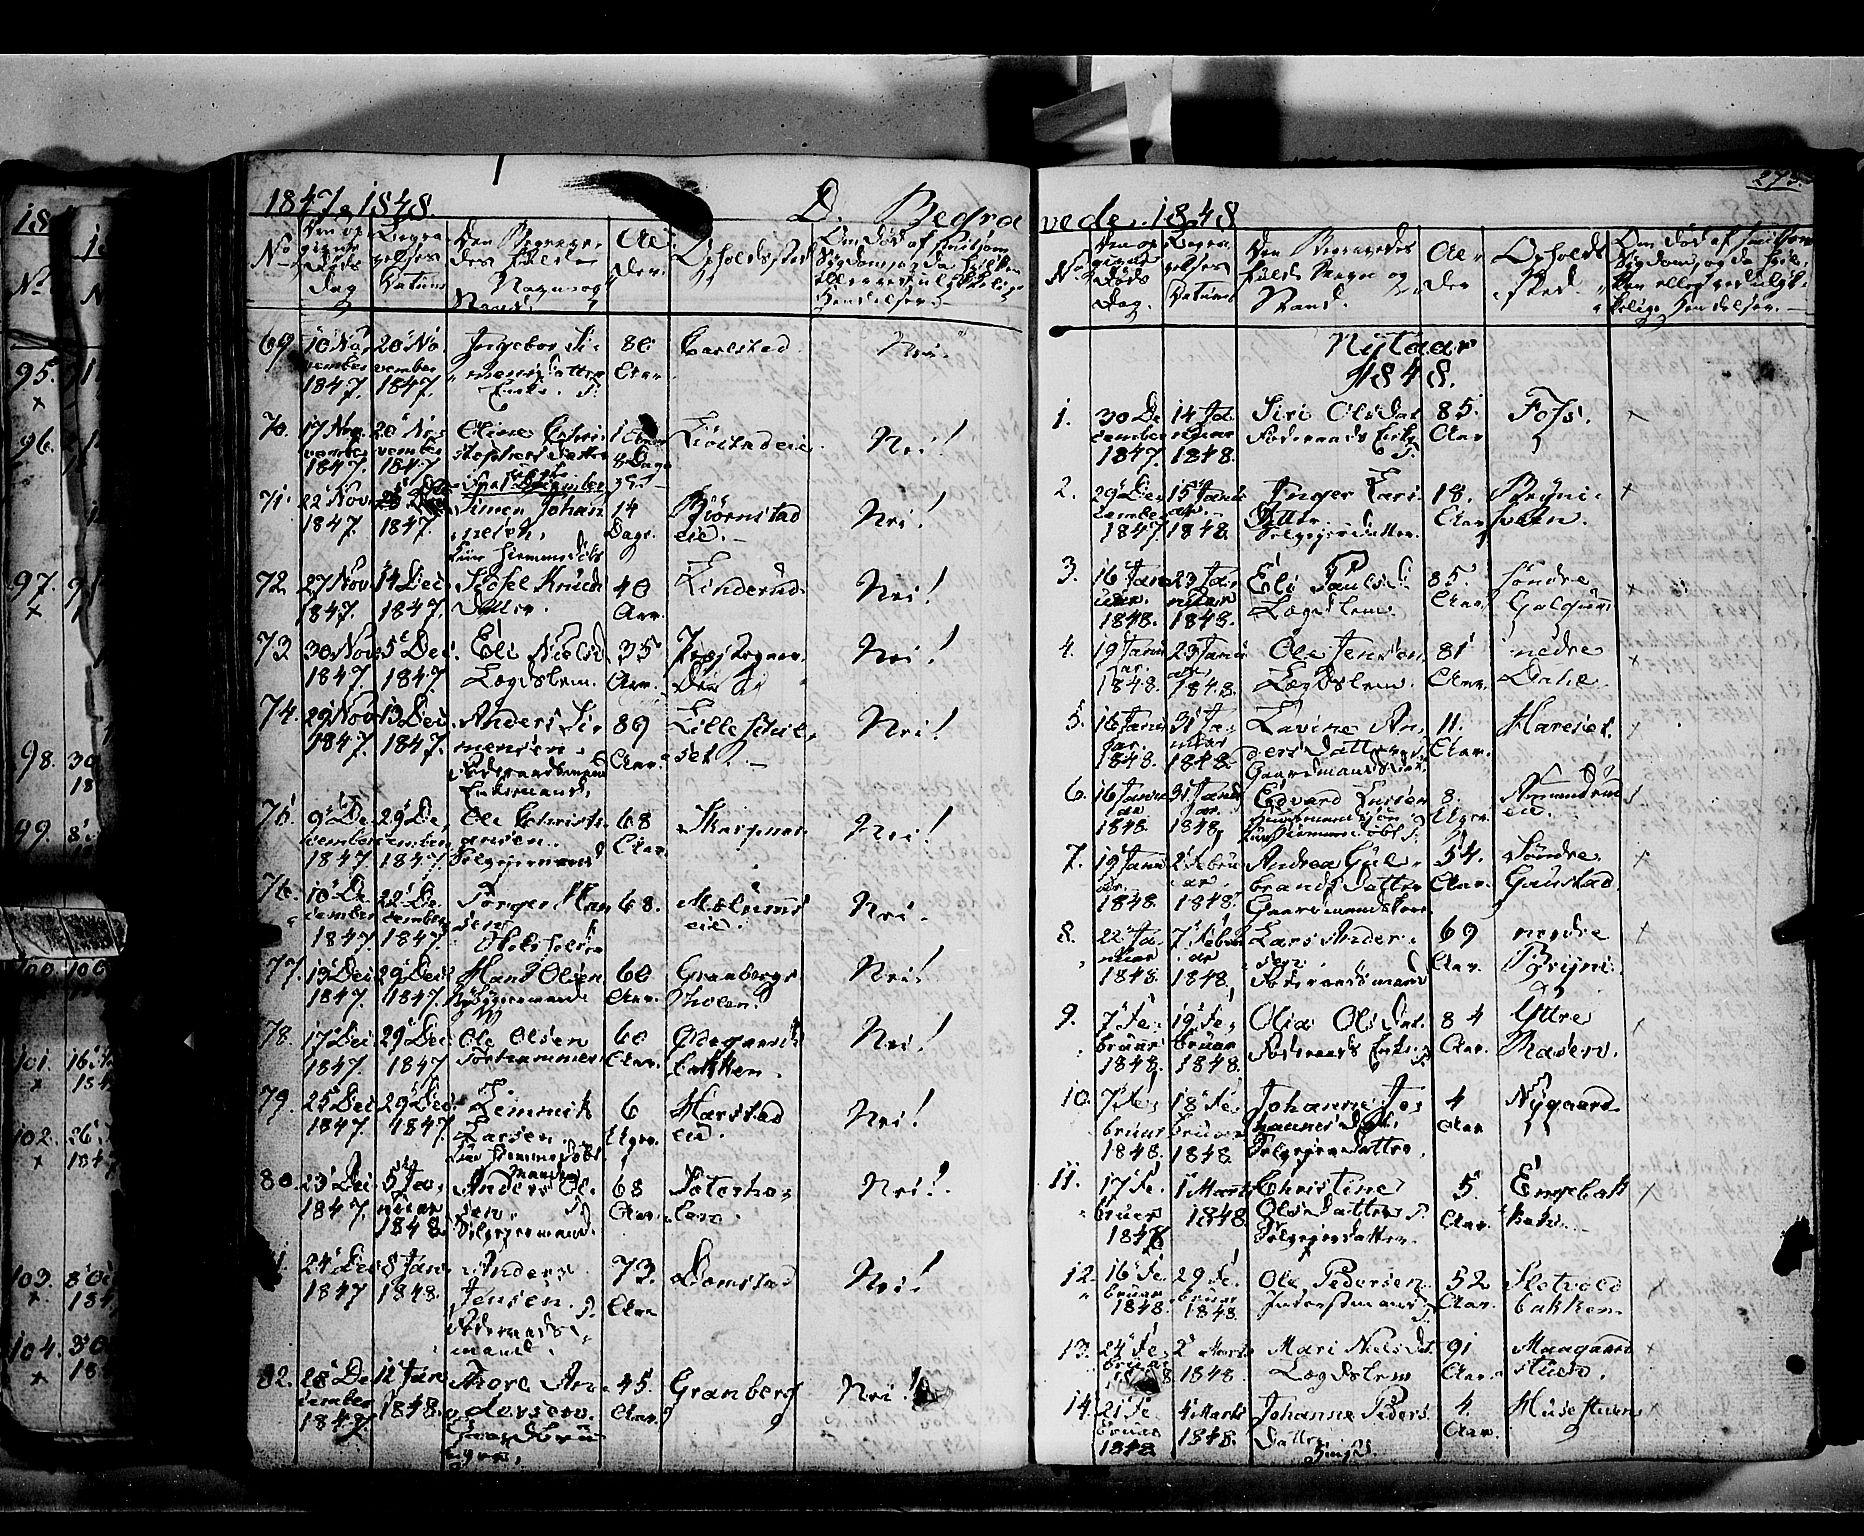 SAH, Romedal prestekontor, K/L0004: Ministerialbok nr. 4, 1847-1861, s. 273